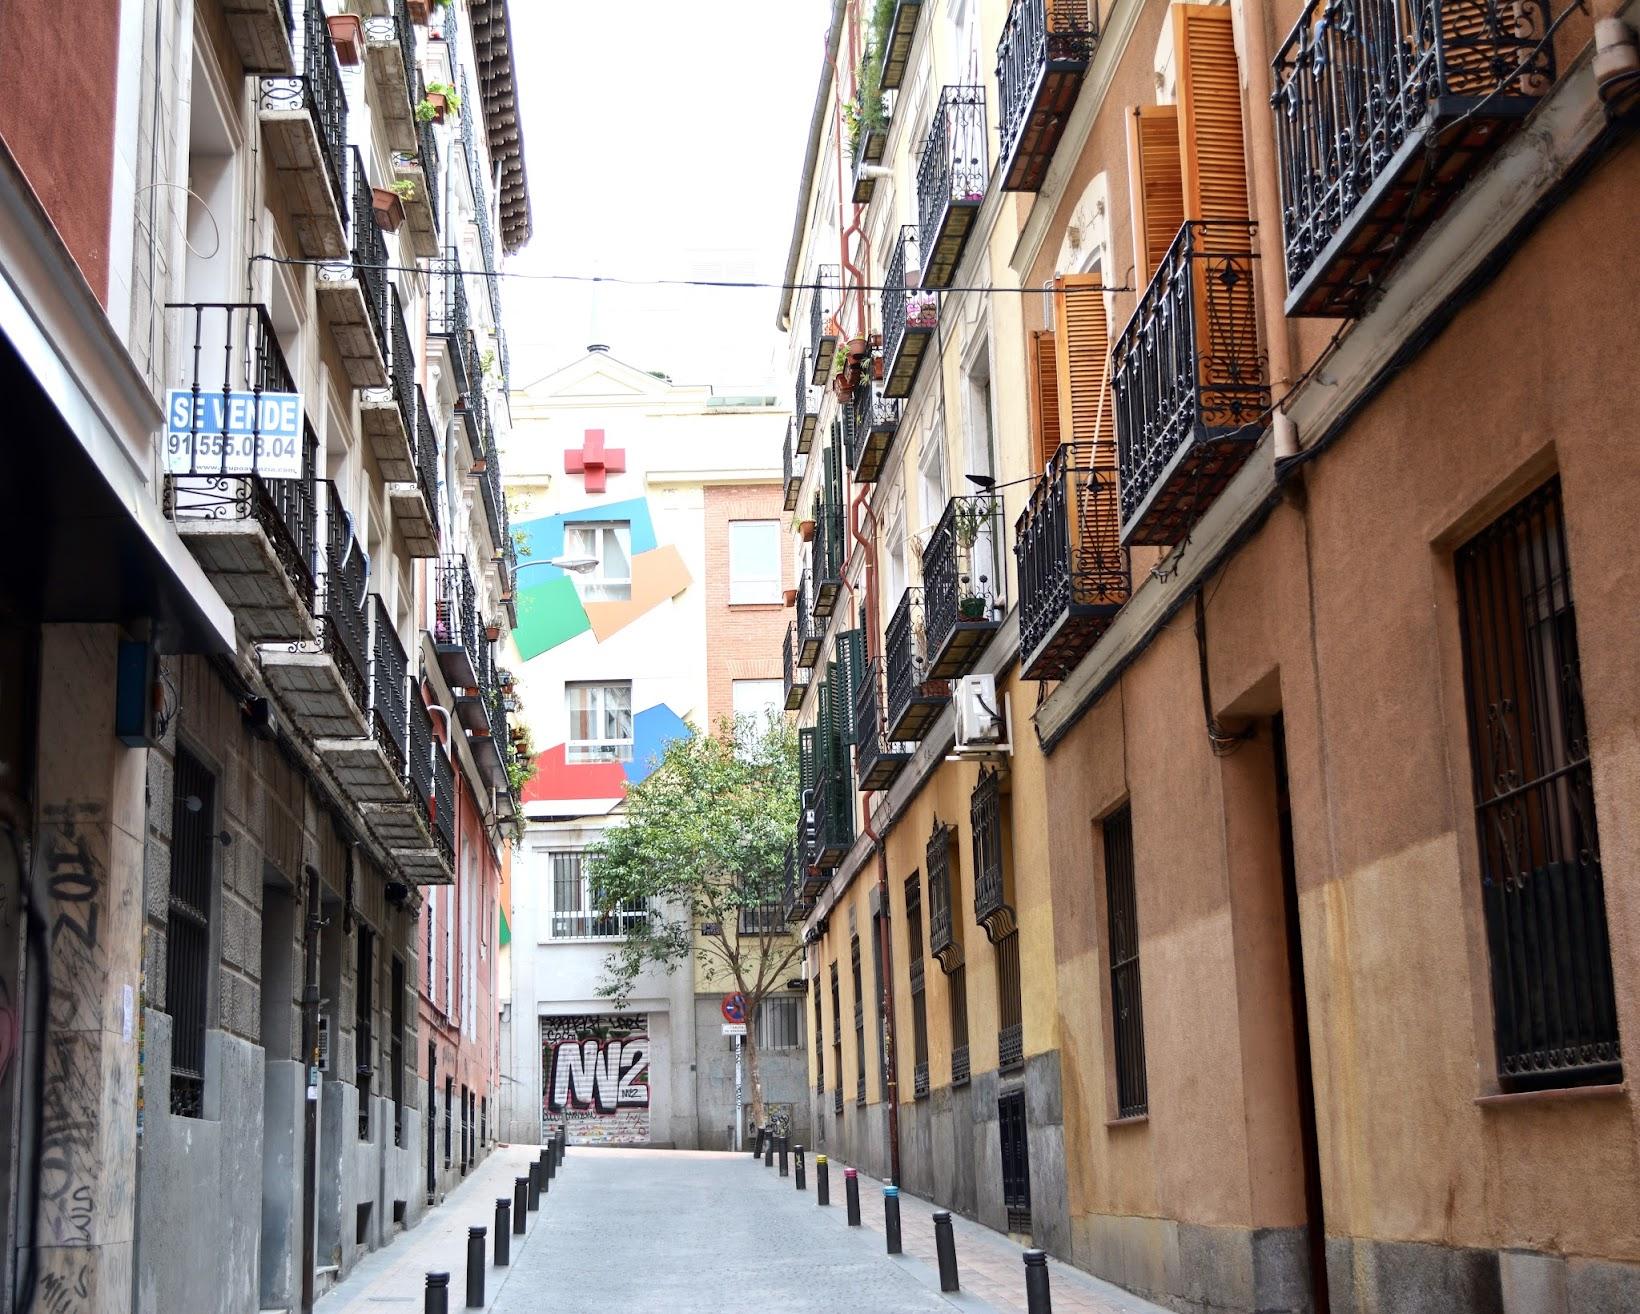 La Cruz Roja, Por Calle San Bernardo, Metro Noviciado, calles de Madrid, Madrid streets